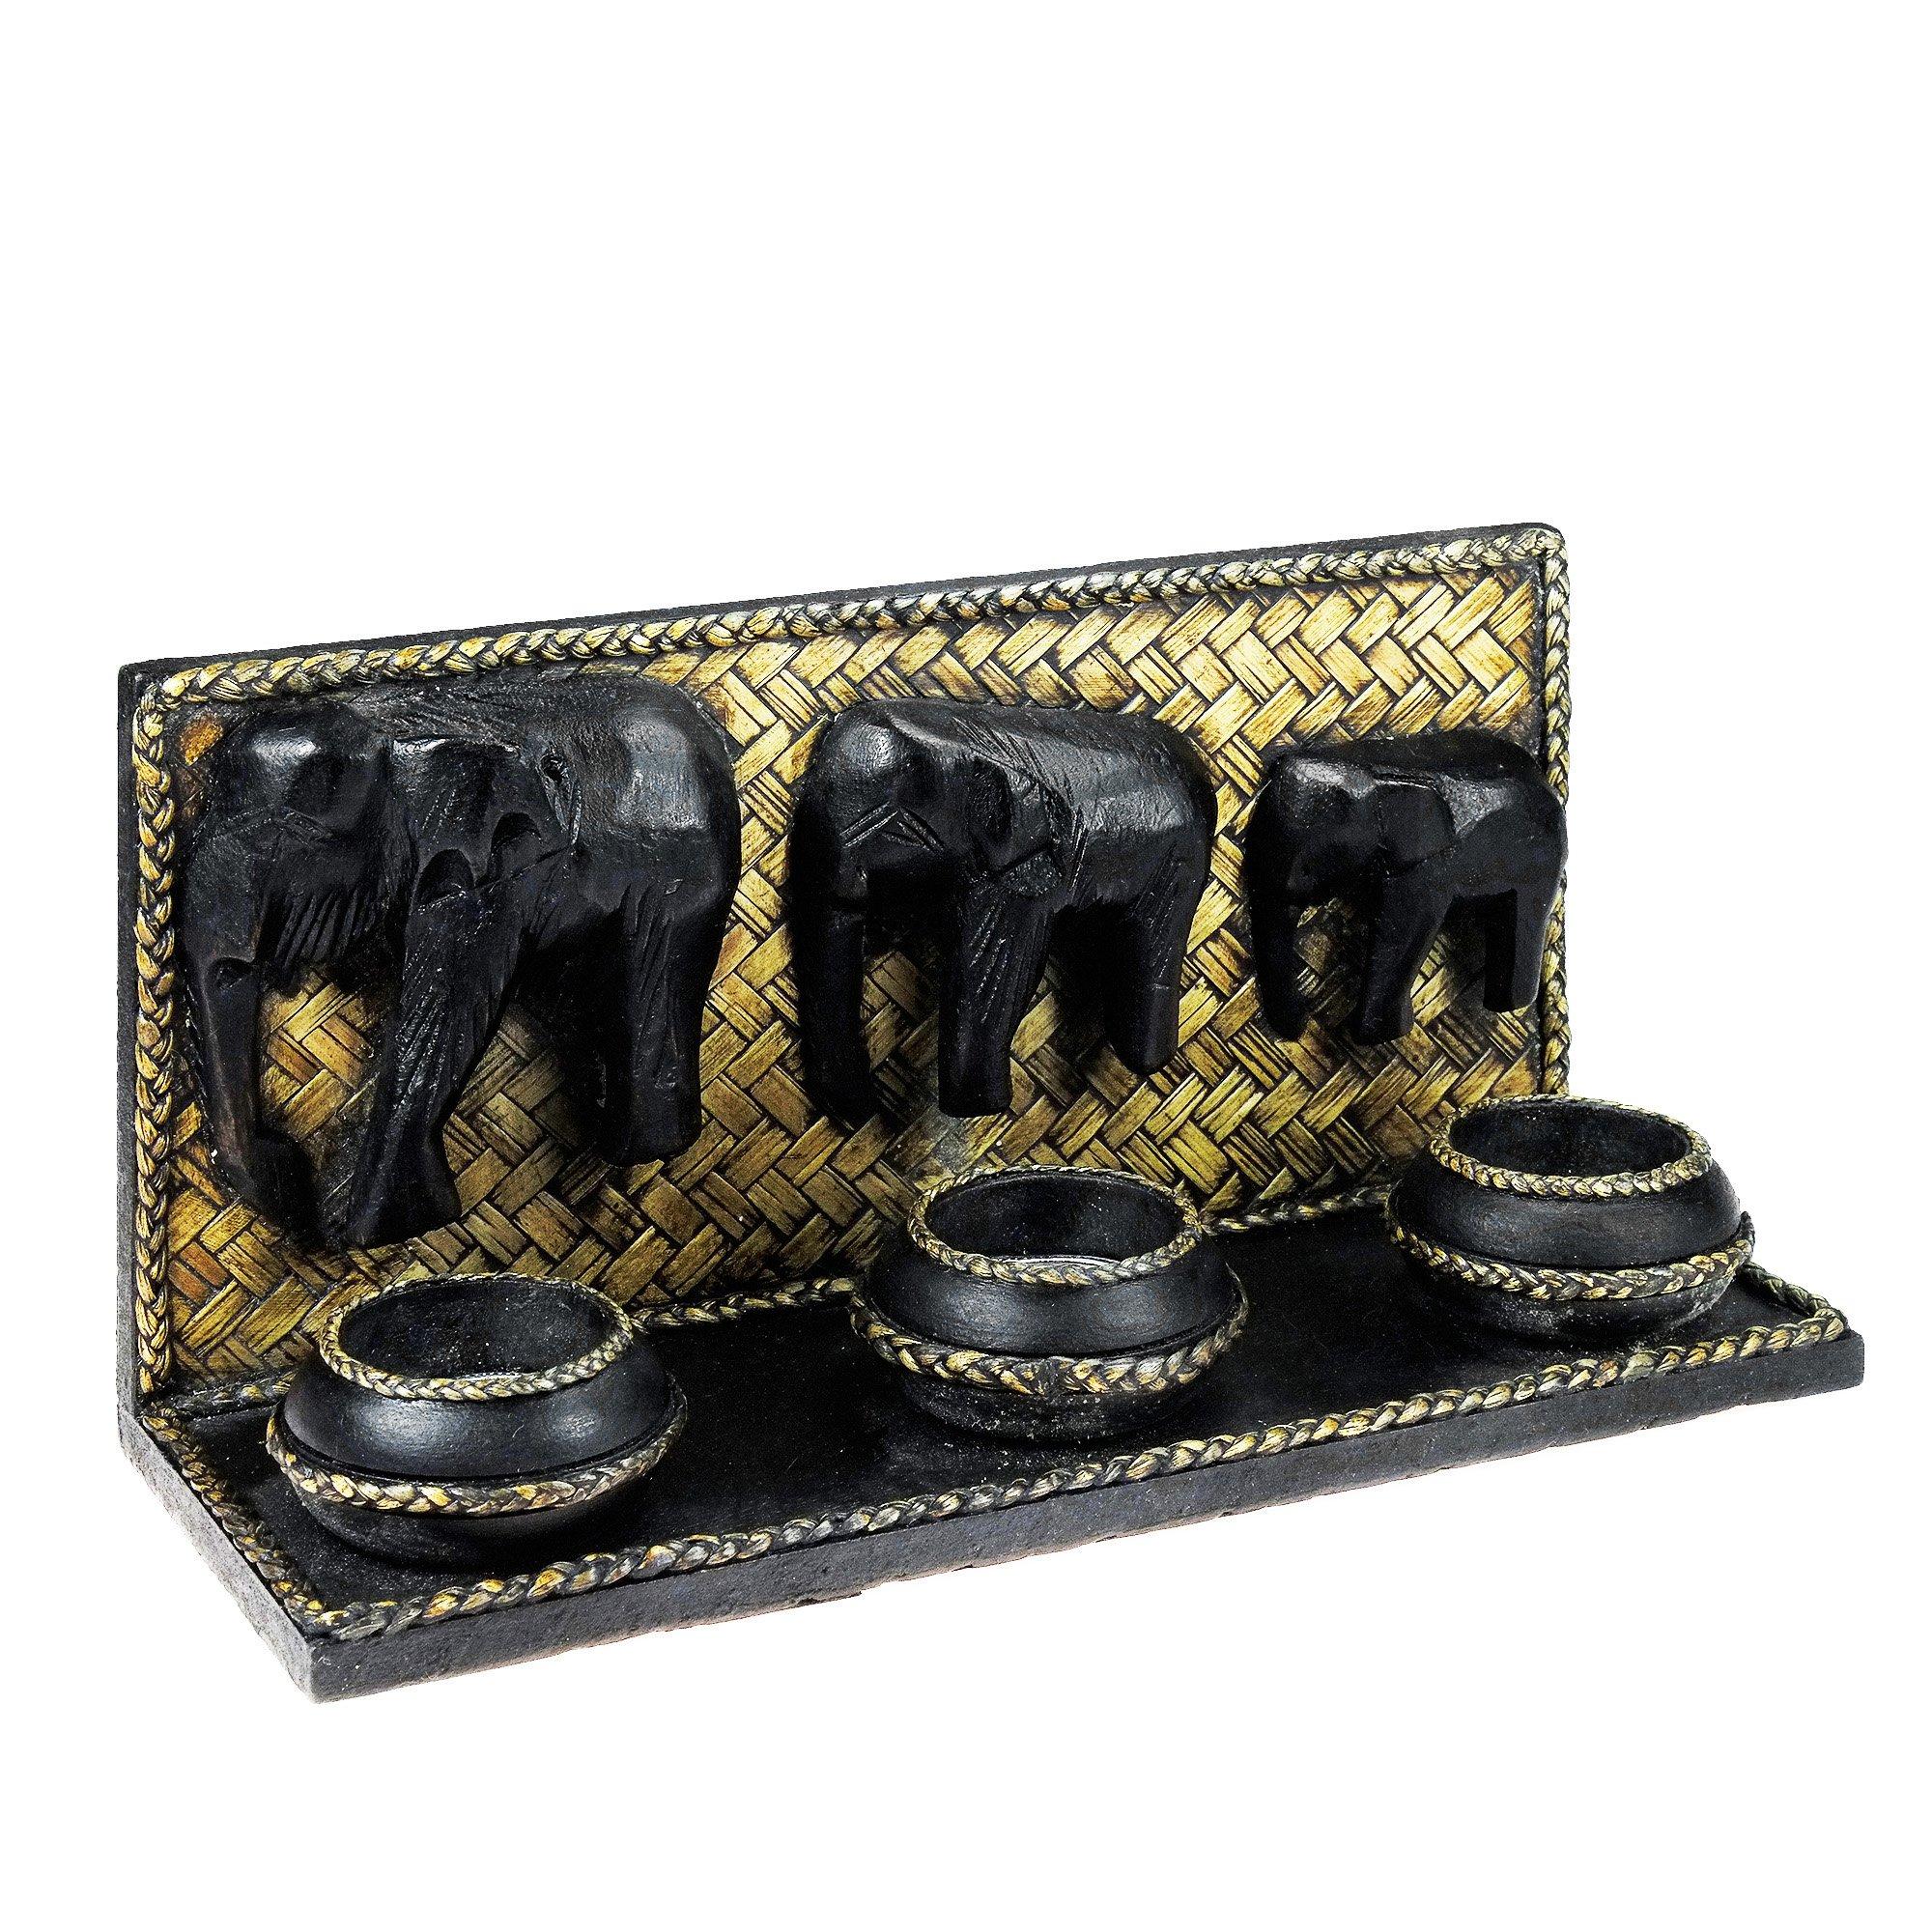 AeraVida Elephant Family Parade Carved Rain Tree Wooden Triple Candle Holder - Fair Trade Handicraft by Thai Artisans